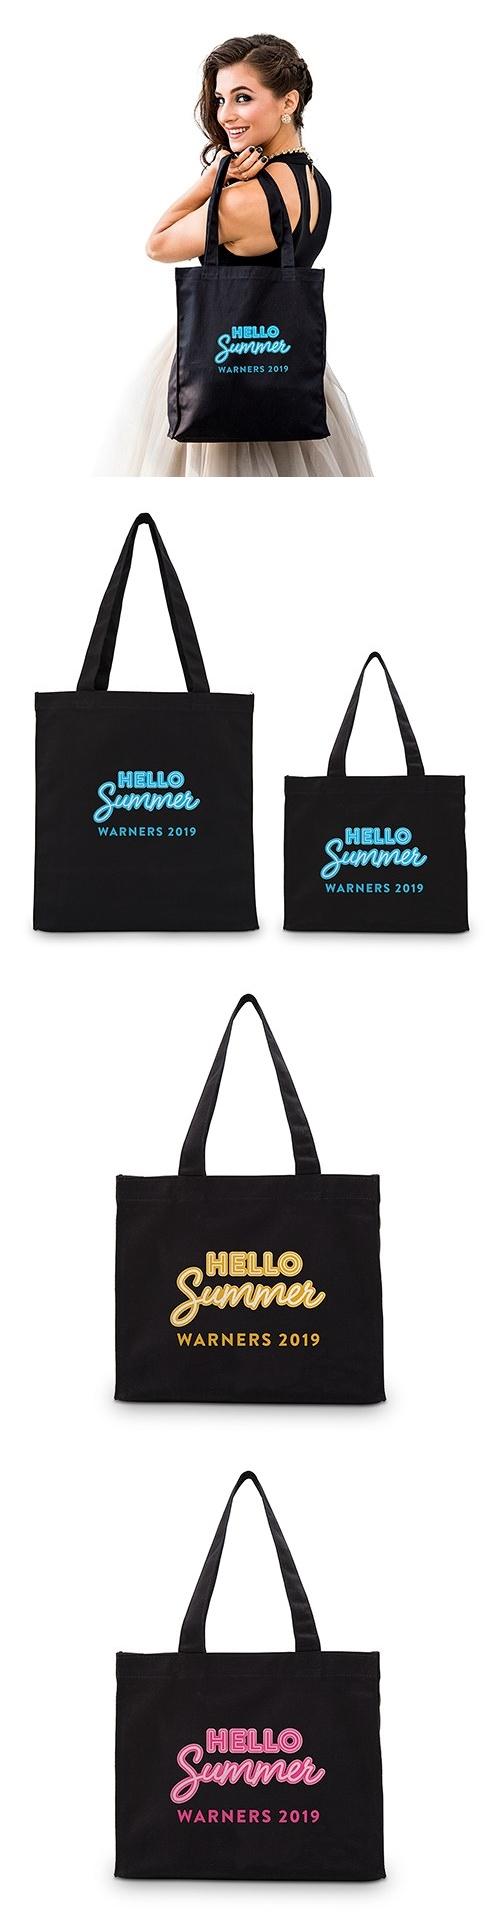 """HELLO Summer"" Personalized Black Canvas Tote Bag"